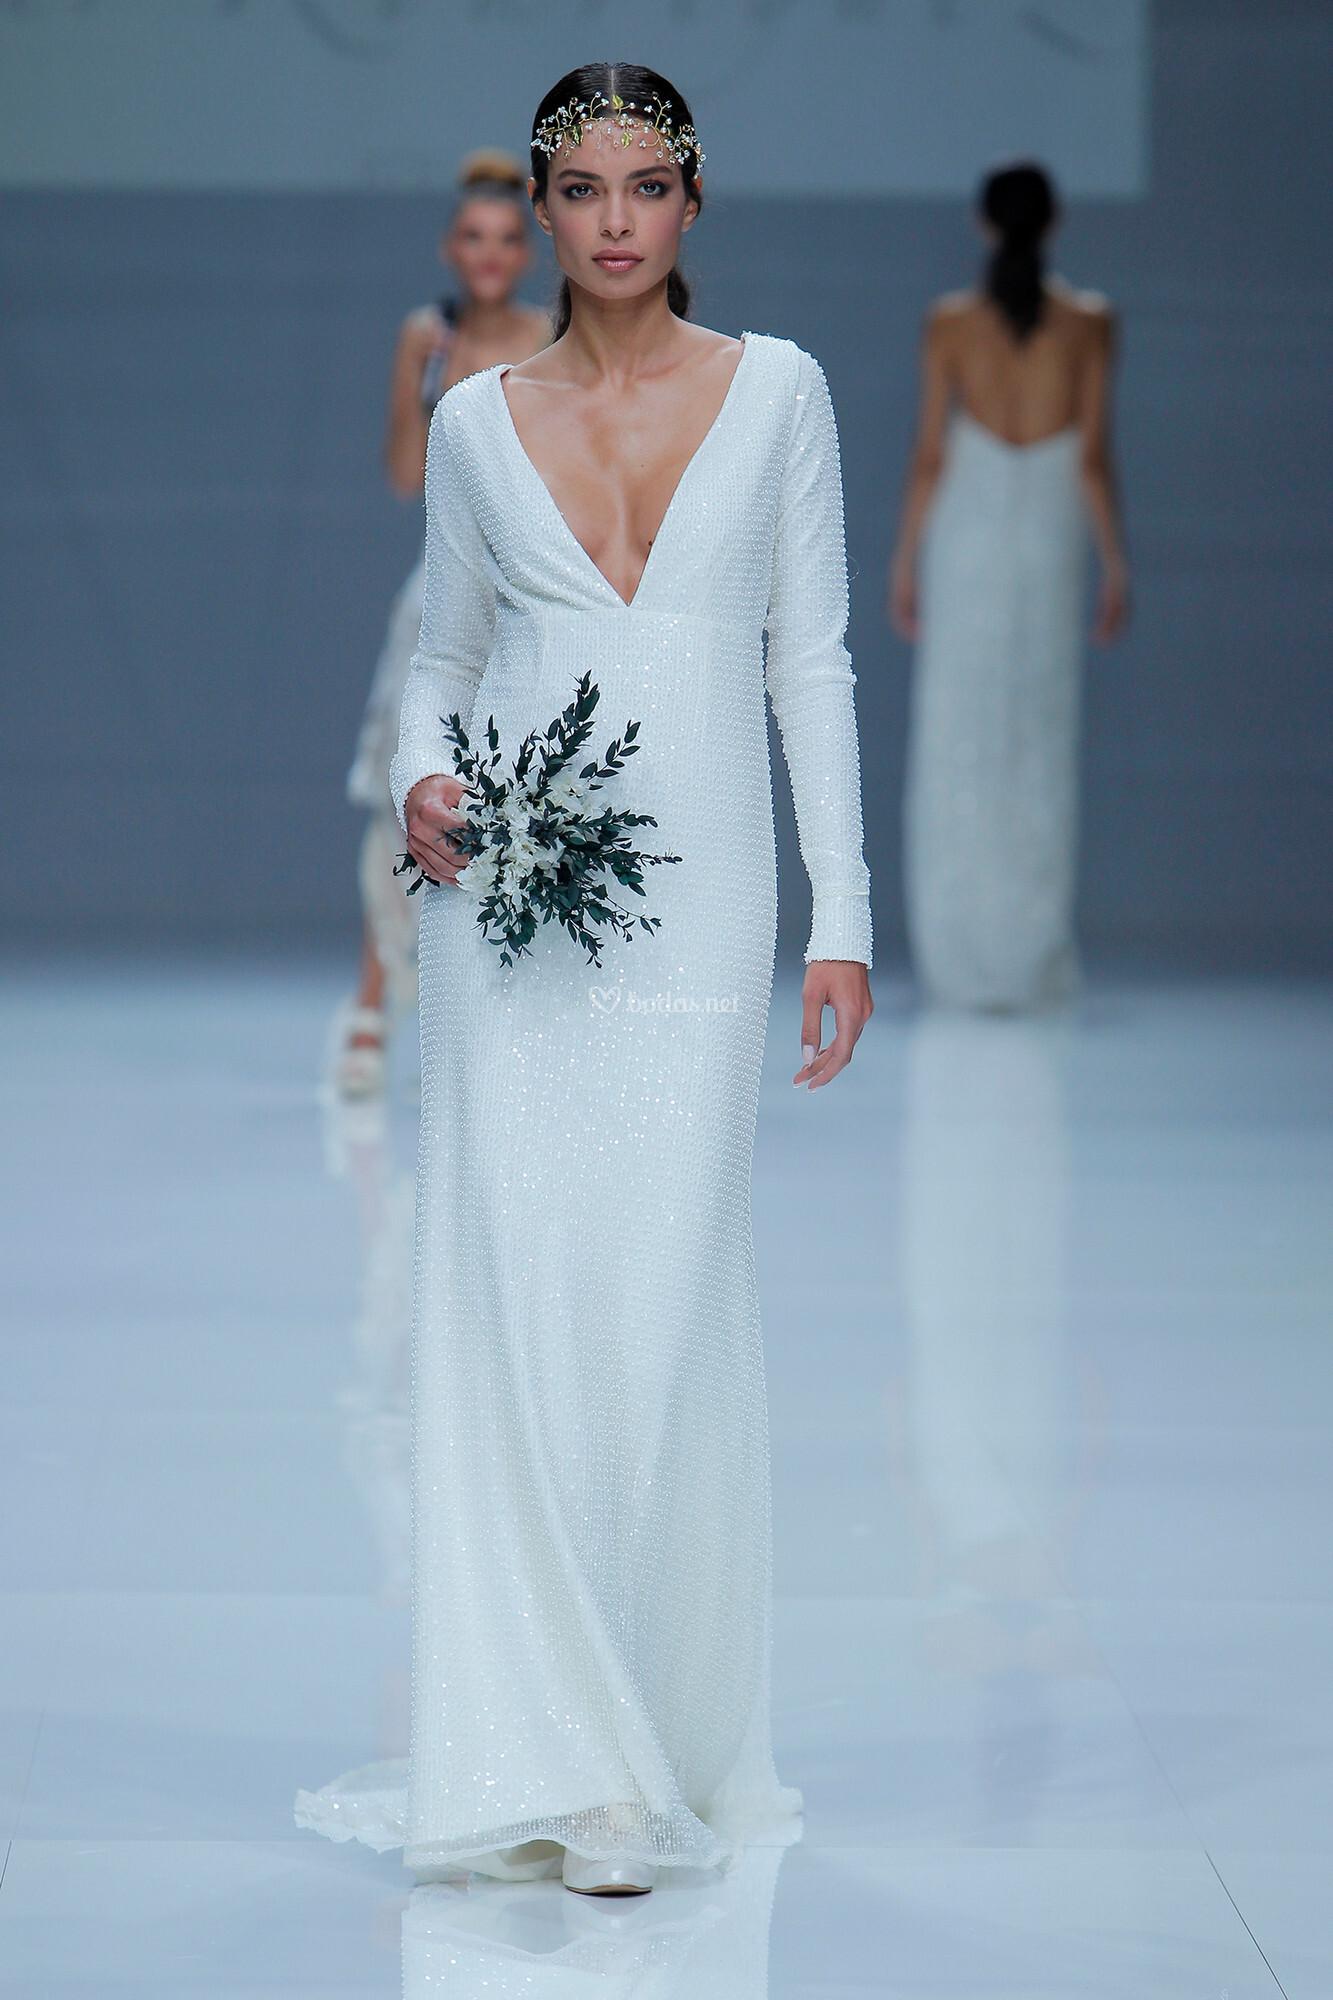 Vestido de Novia de Mar Rodríguez - MR 009